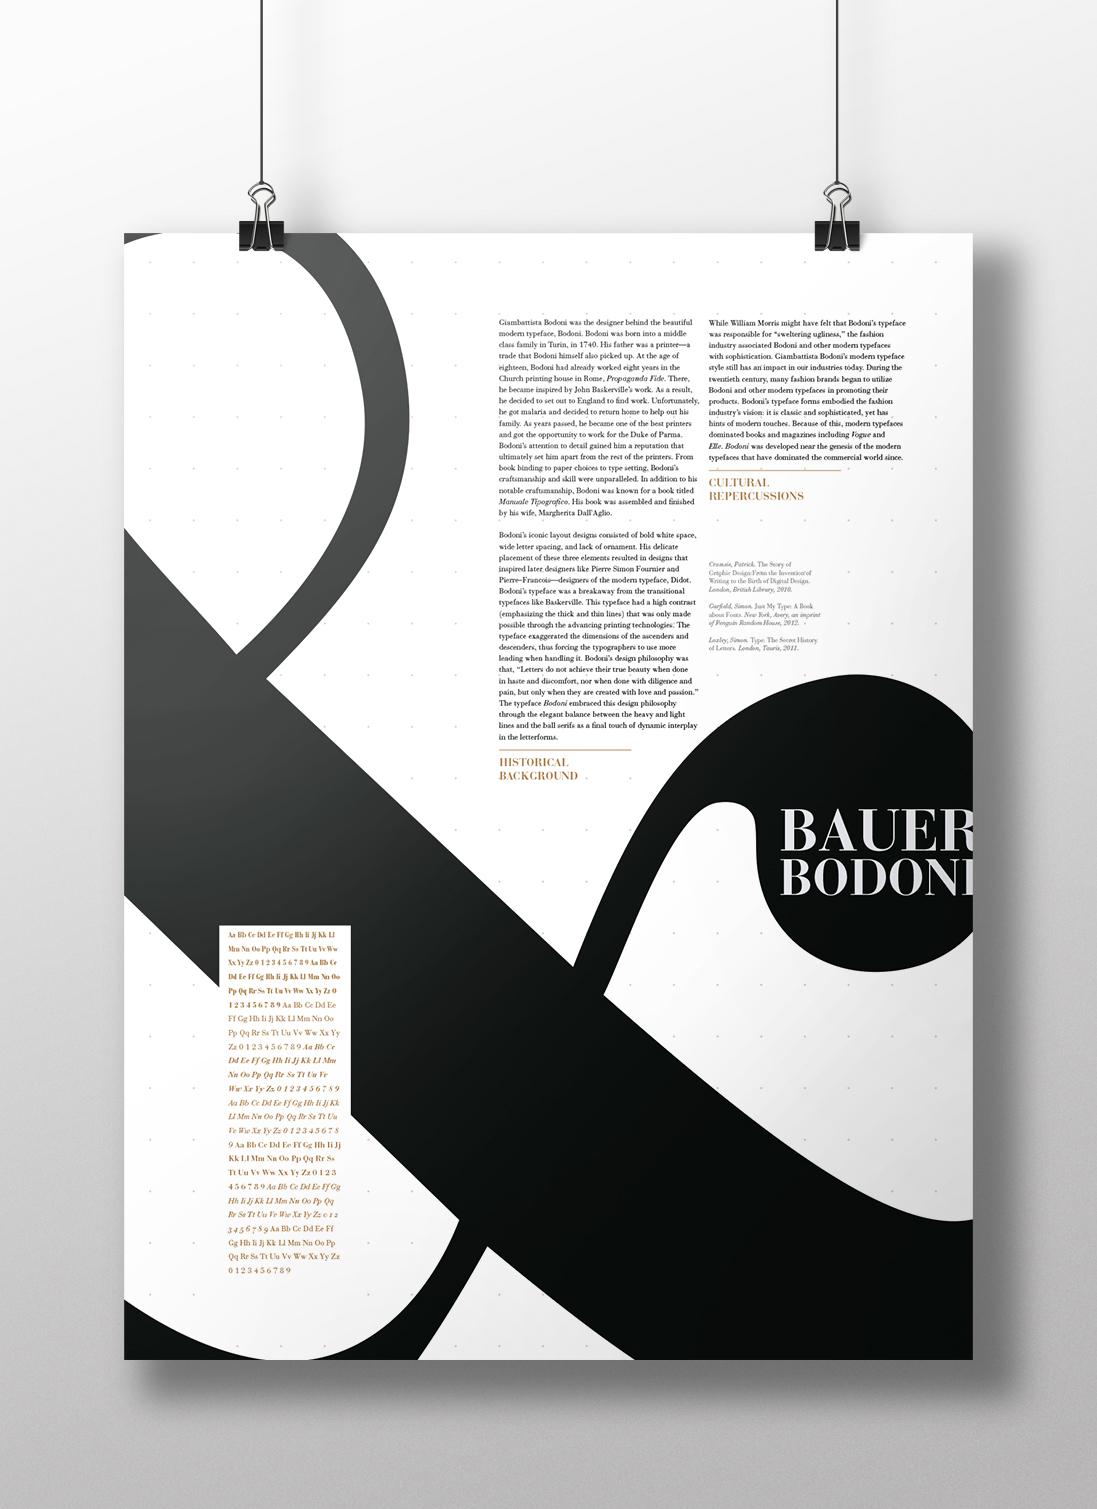 Bodoni Poster: Informational Side